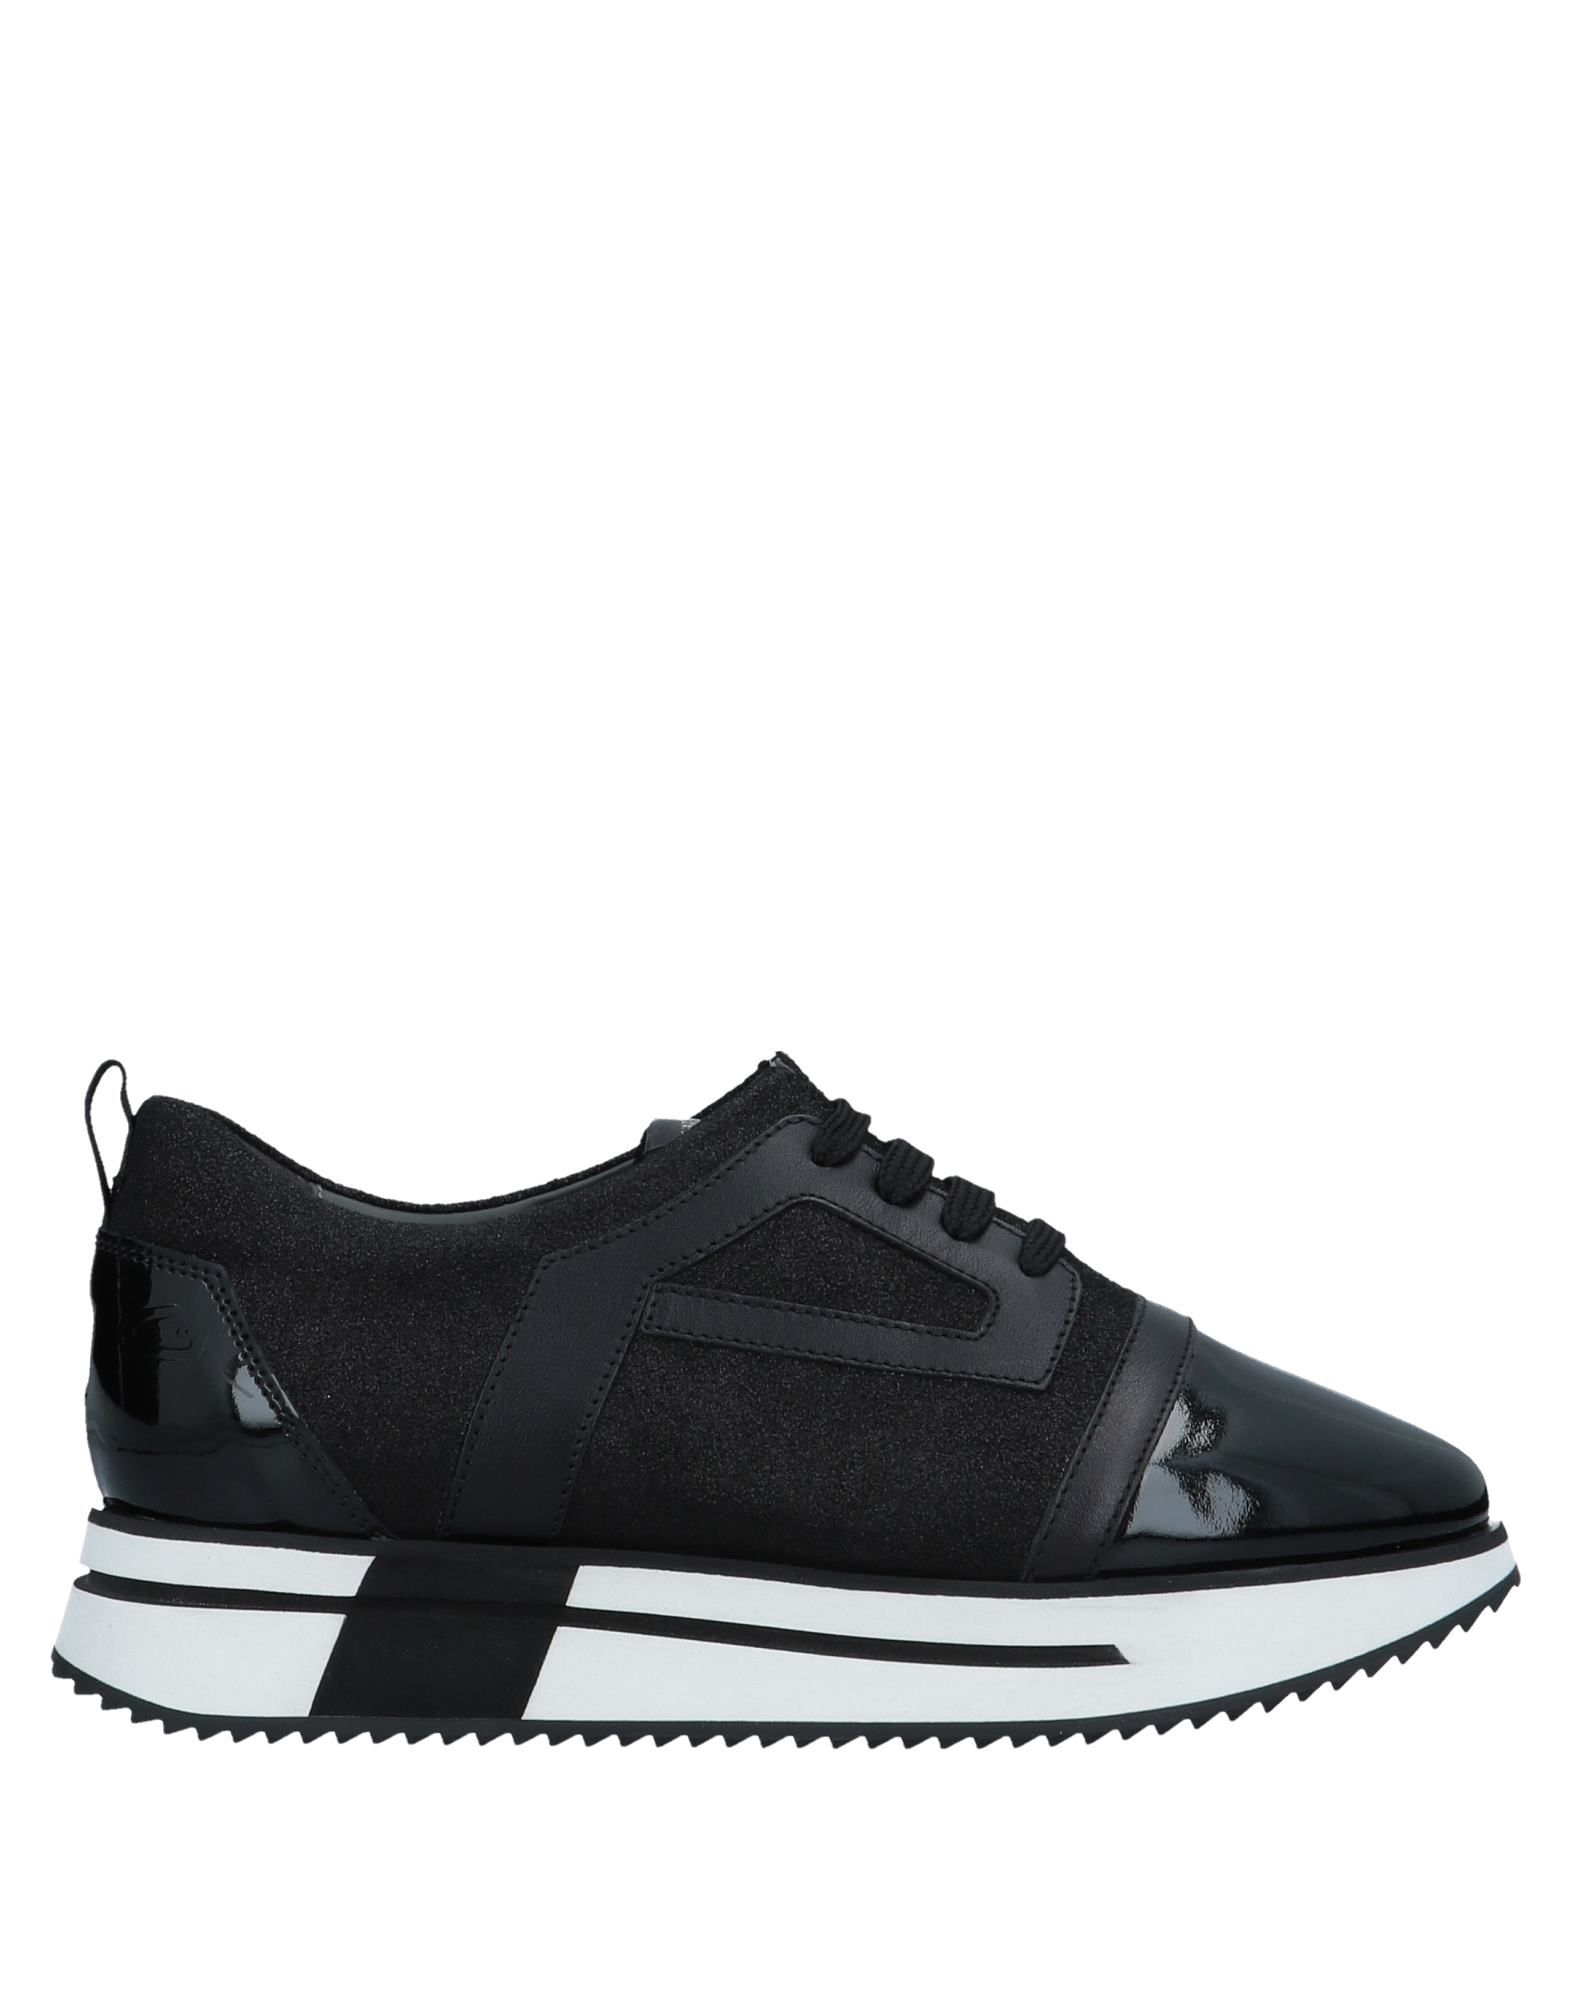 Alberto Alberto Guardiani Sneakers - Women Alberto Alberto Guardiani Sneakers online on  United Kingdom - 11568032MF abcf7a